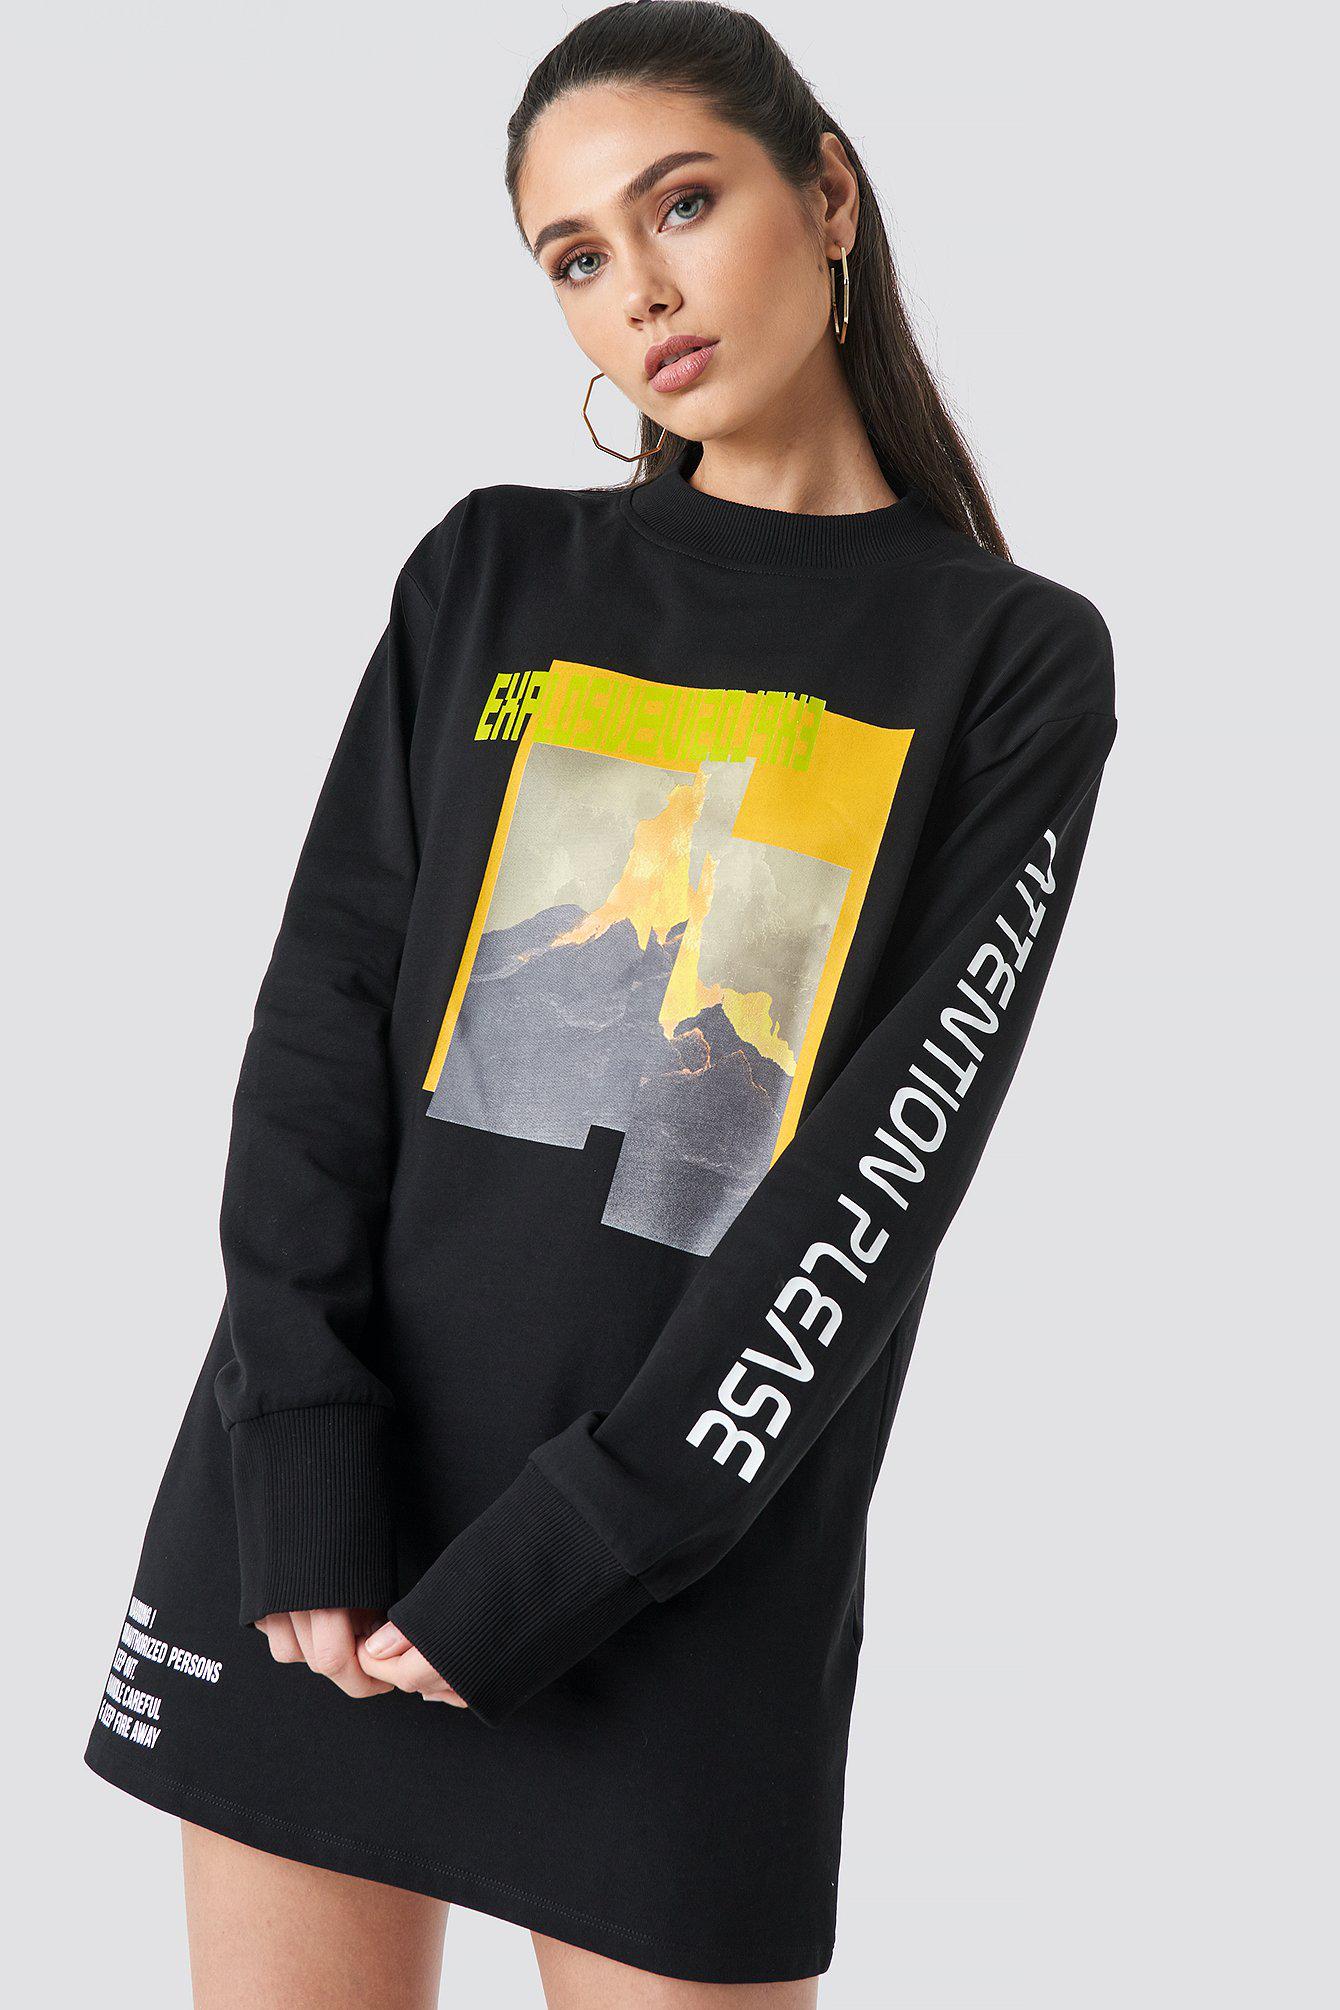 39ff4e4e7b2 Anna Nooshin X Na-Kd Explosive Long Sleeve T-Shirt Dress - Black